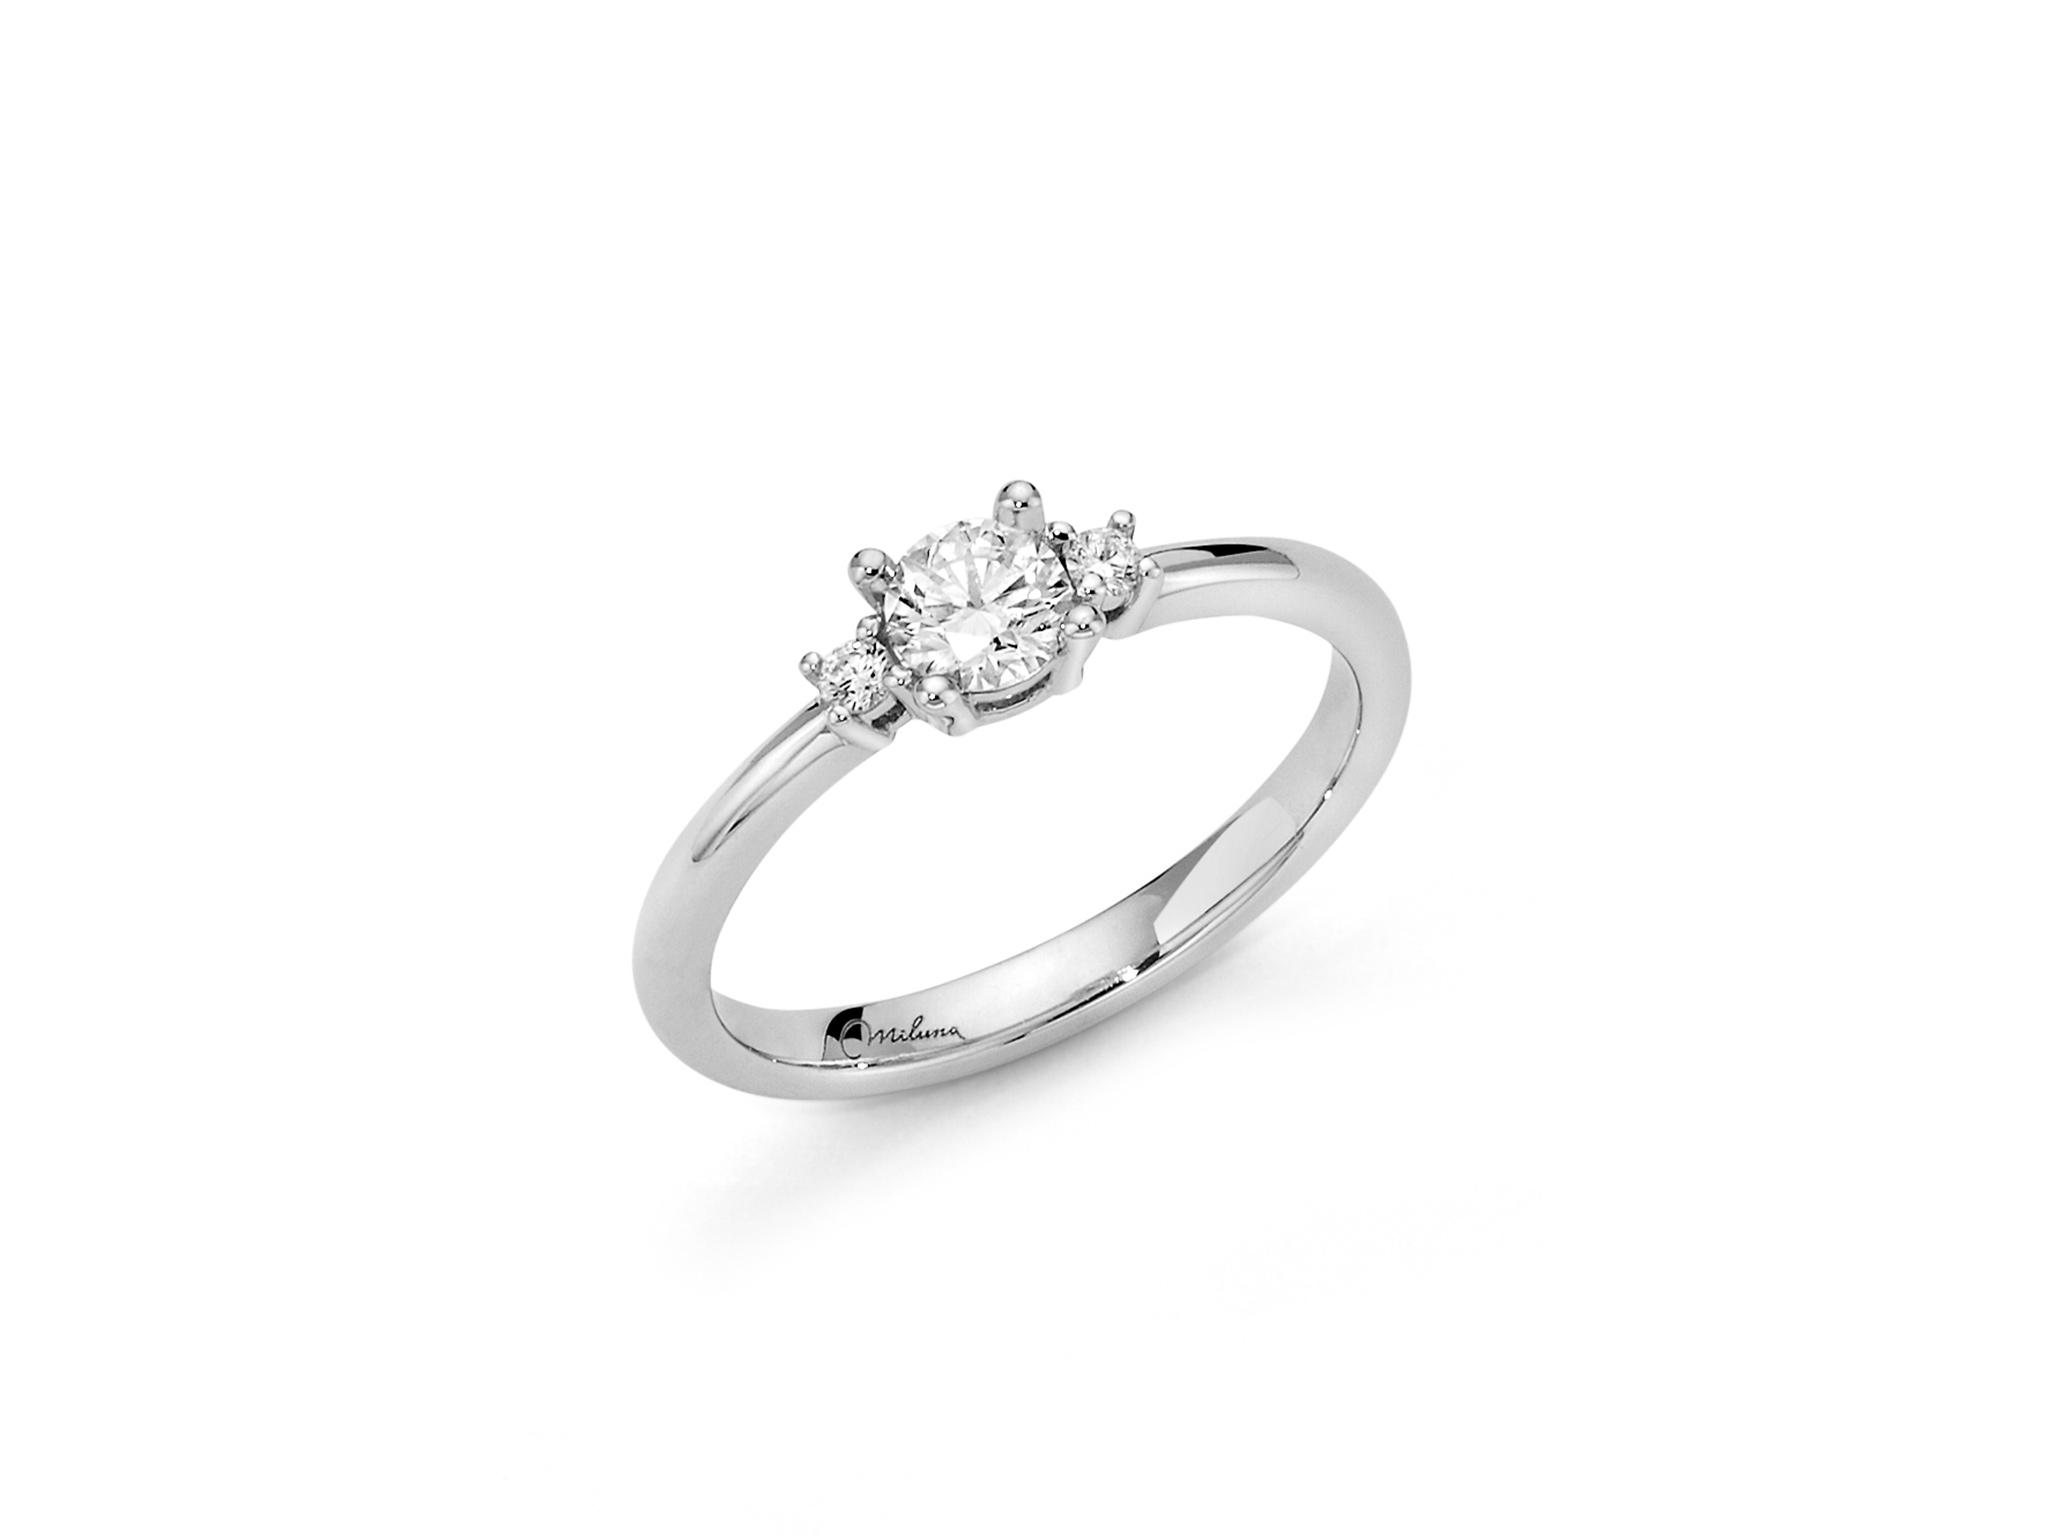 Solitario con diamanti. - LID3429-032G7